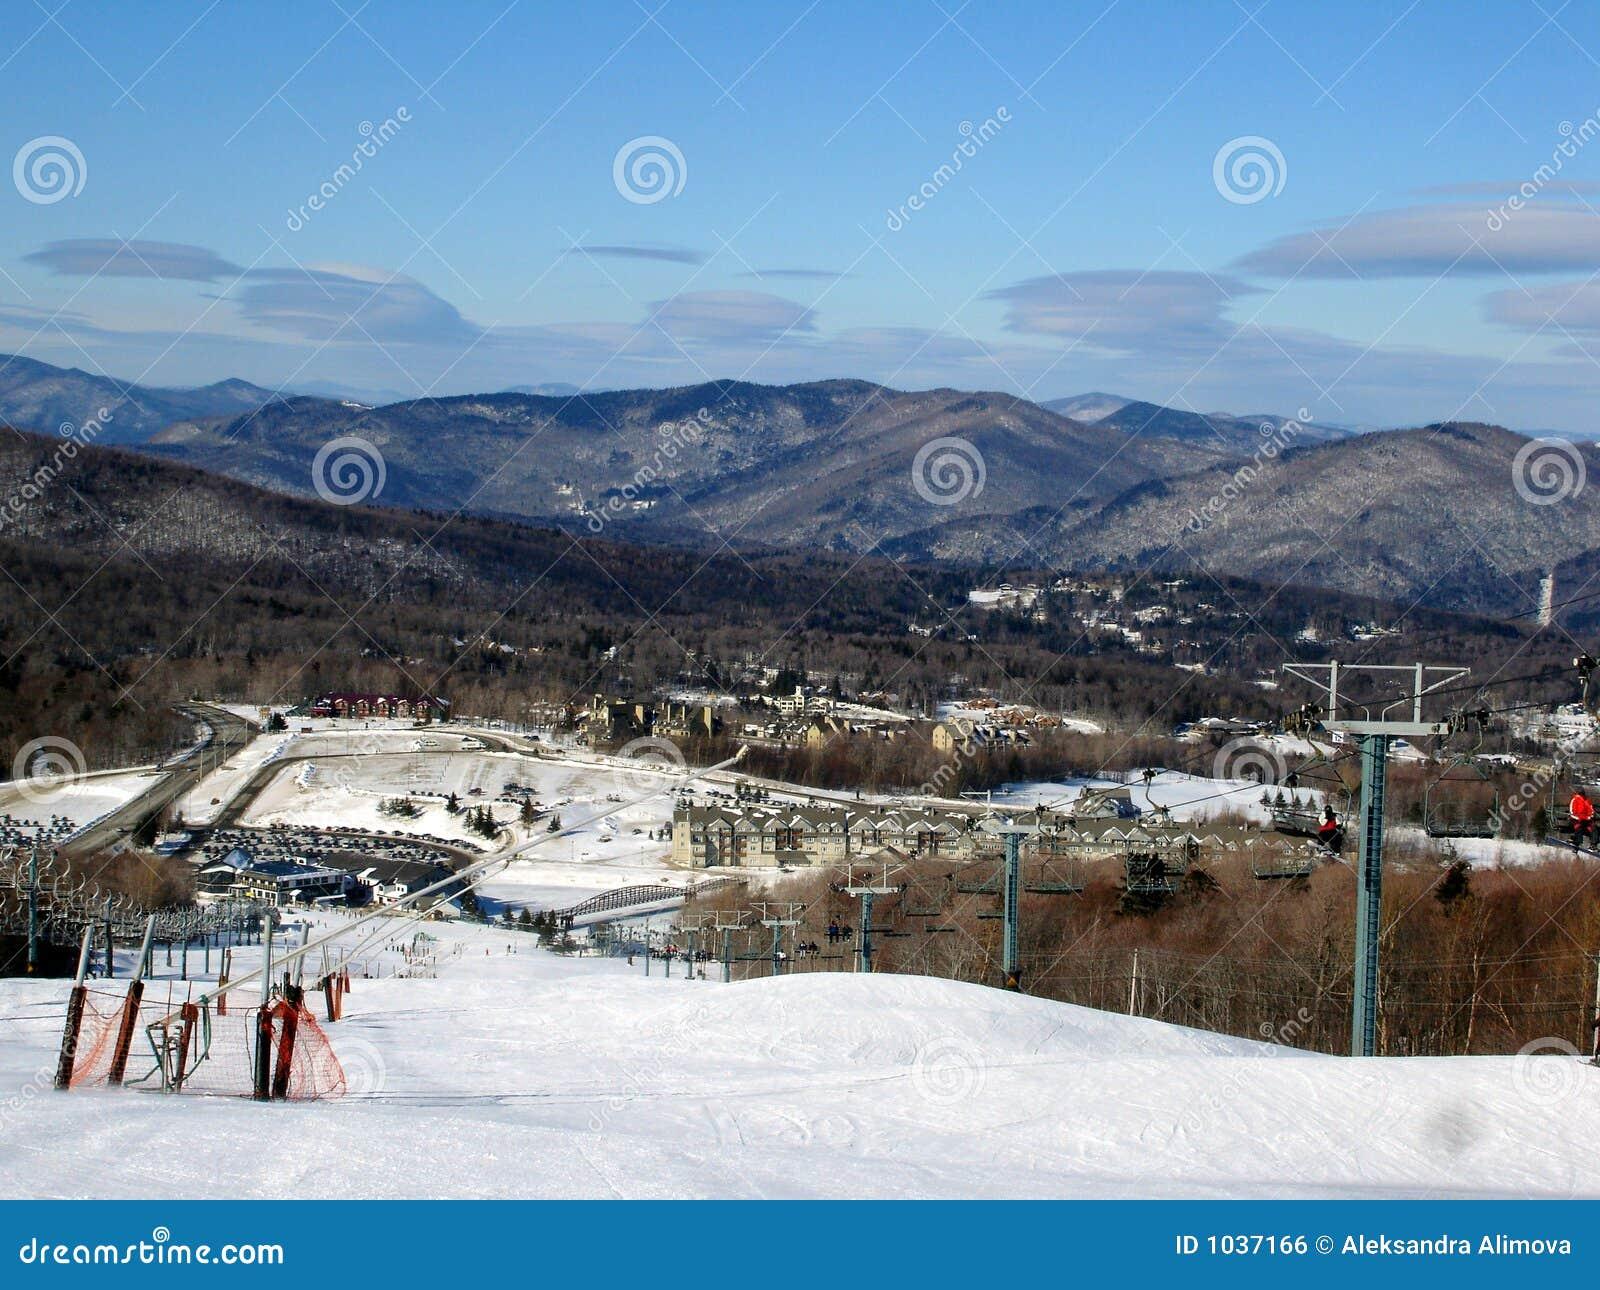 Killington ski resort, VT